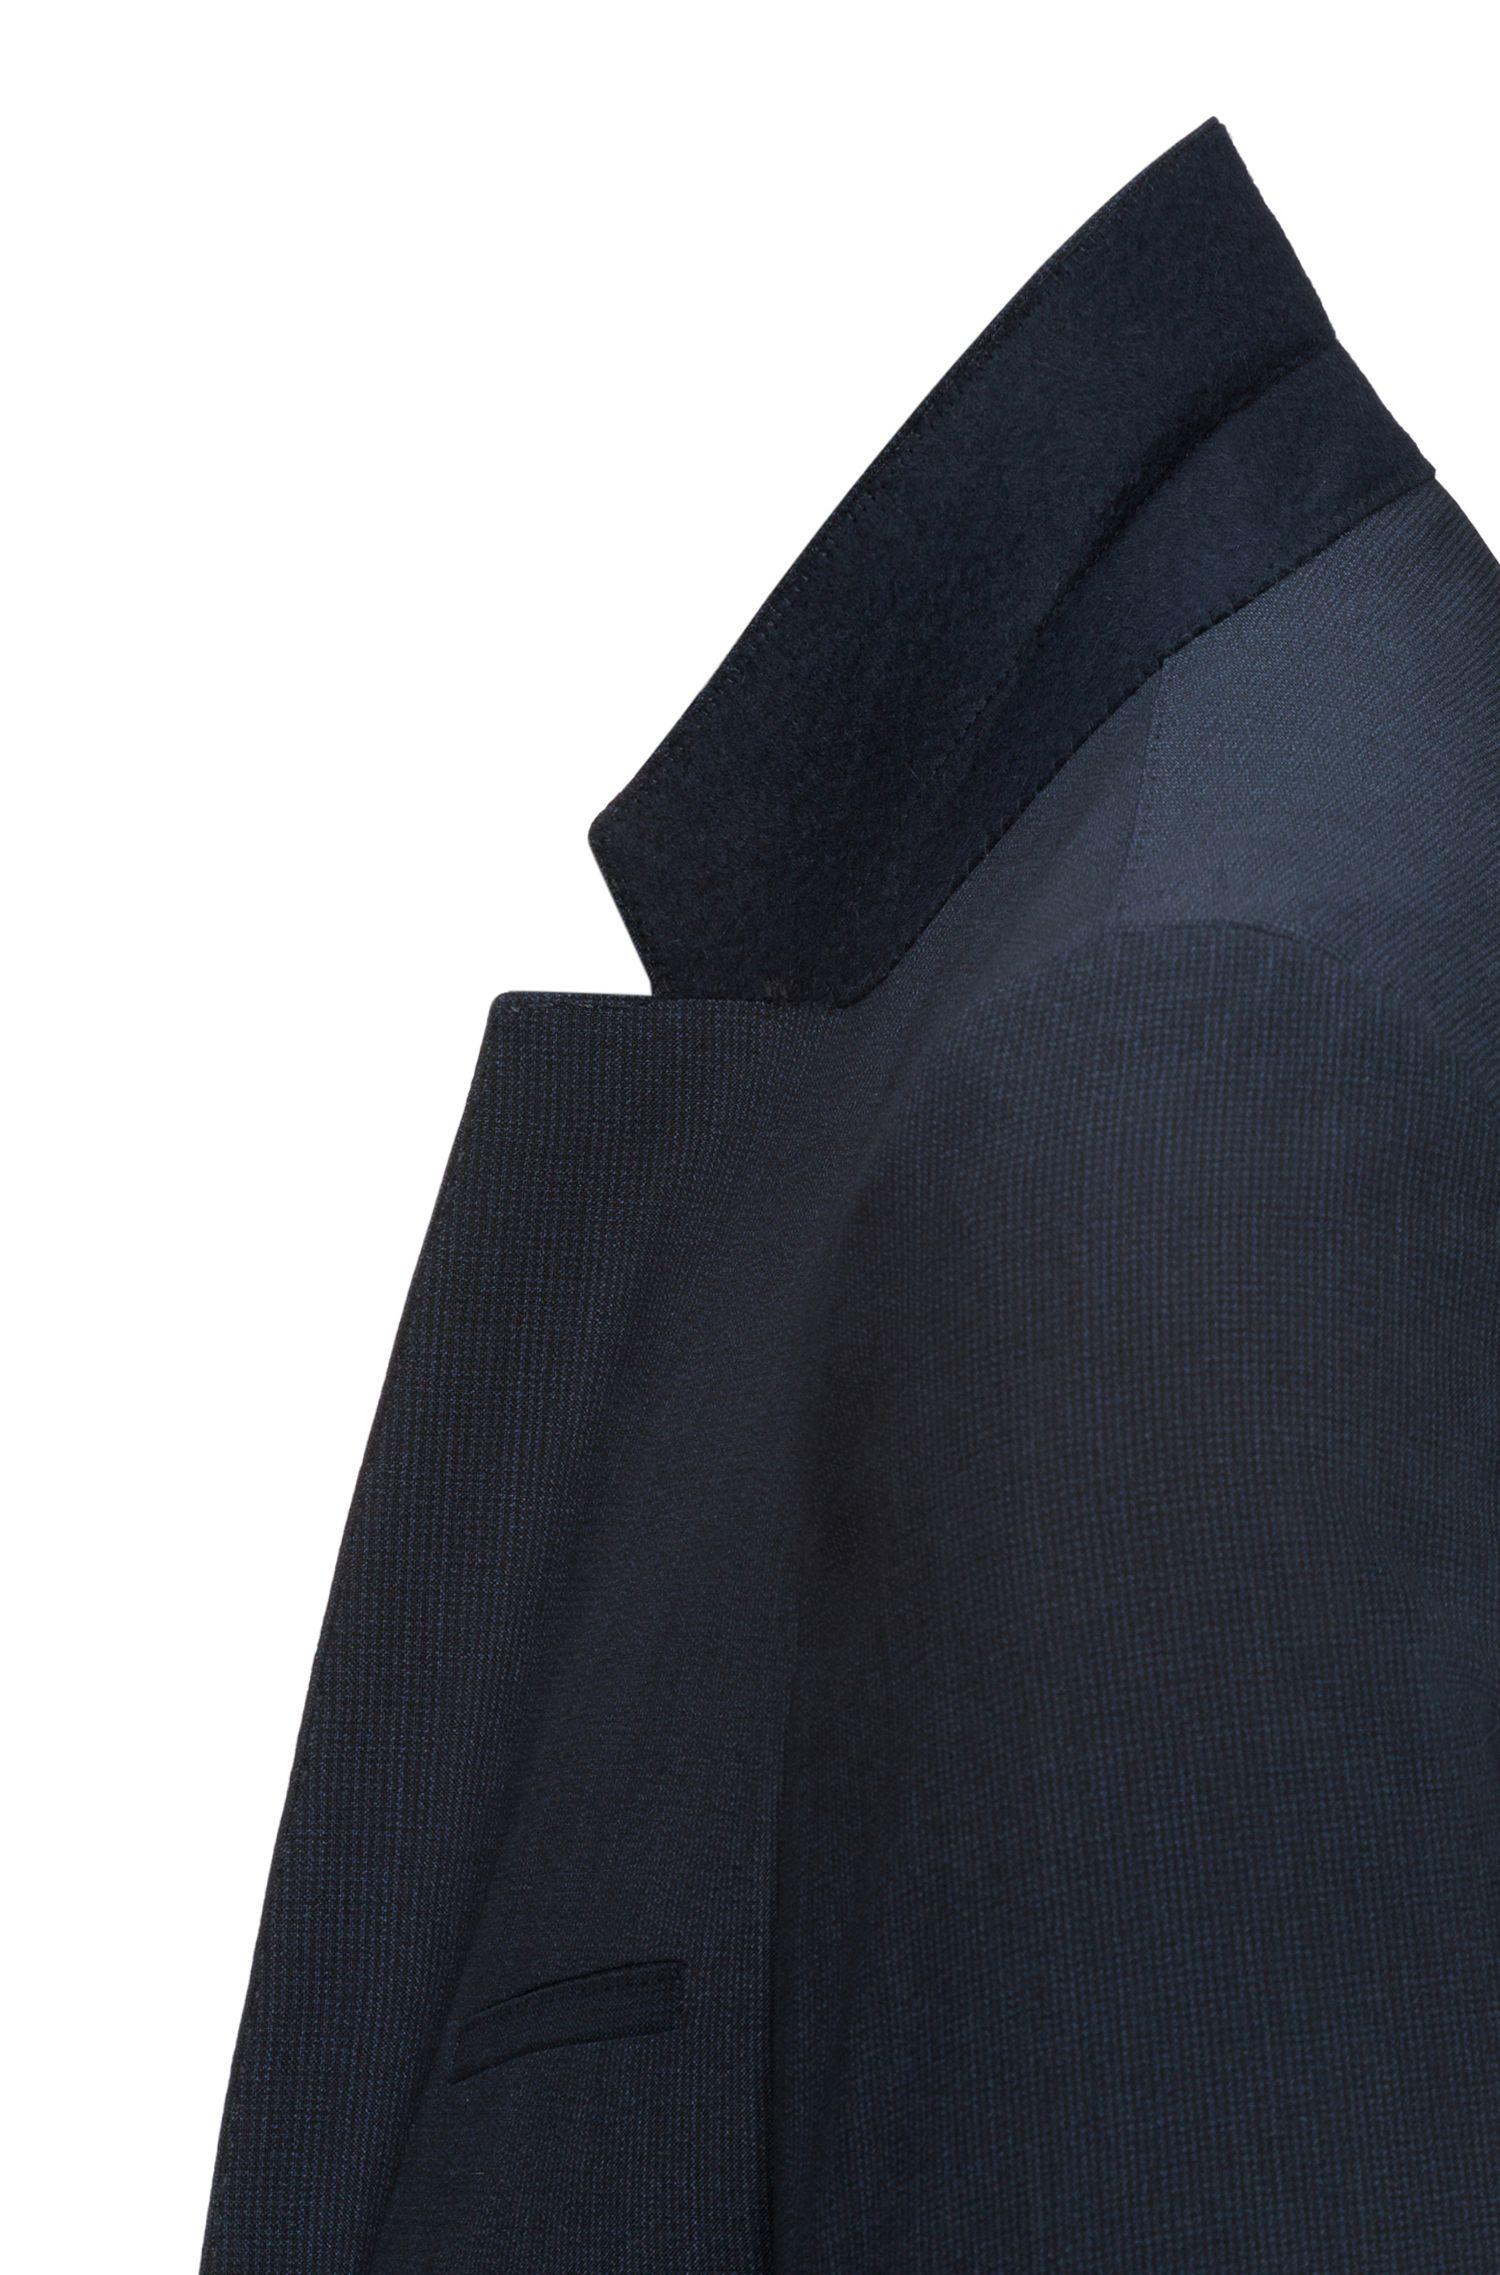 Italian Virgin Wool Suit, Extra-Slim Fit | Arti/Hesten, Dark Blue